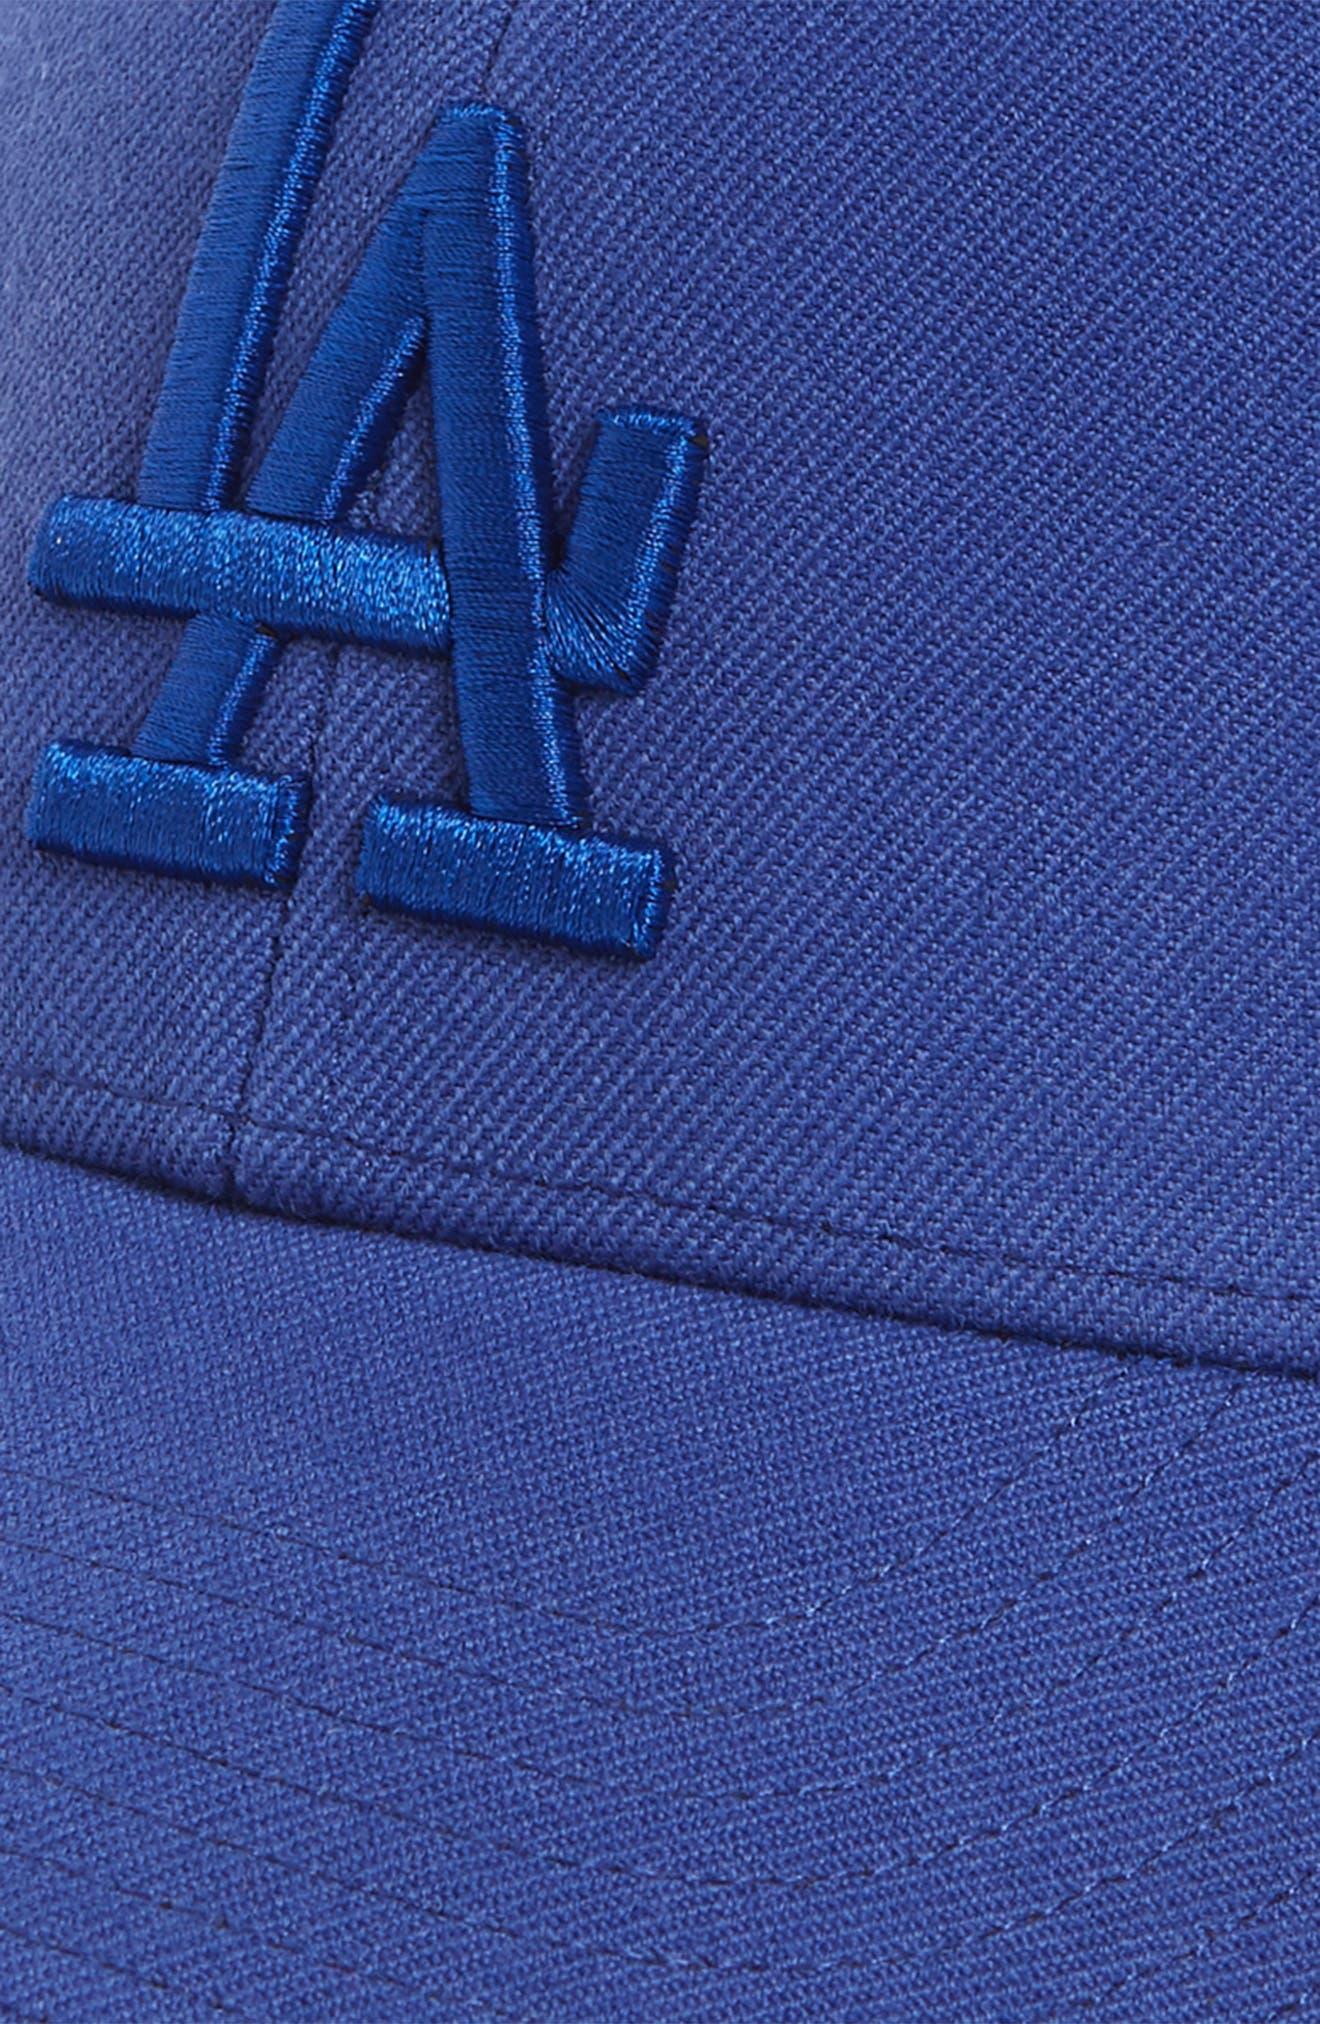 MVP LA Dodgers Baseball Cap,                             Alternate thumbnail 3, color,                             Royal